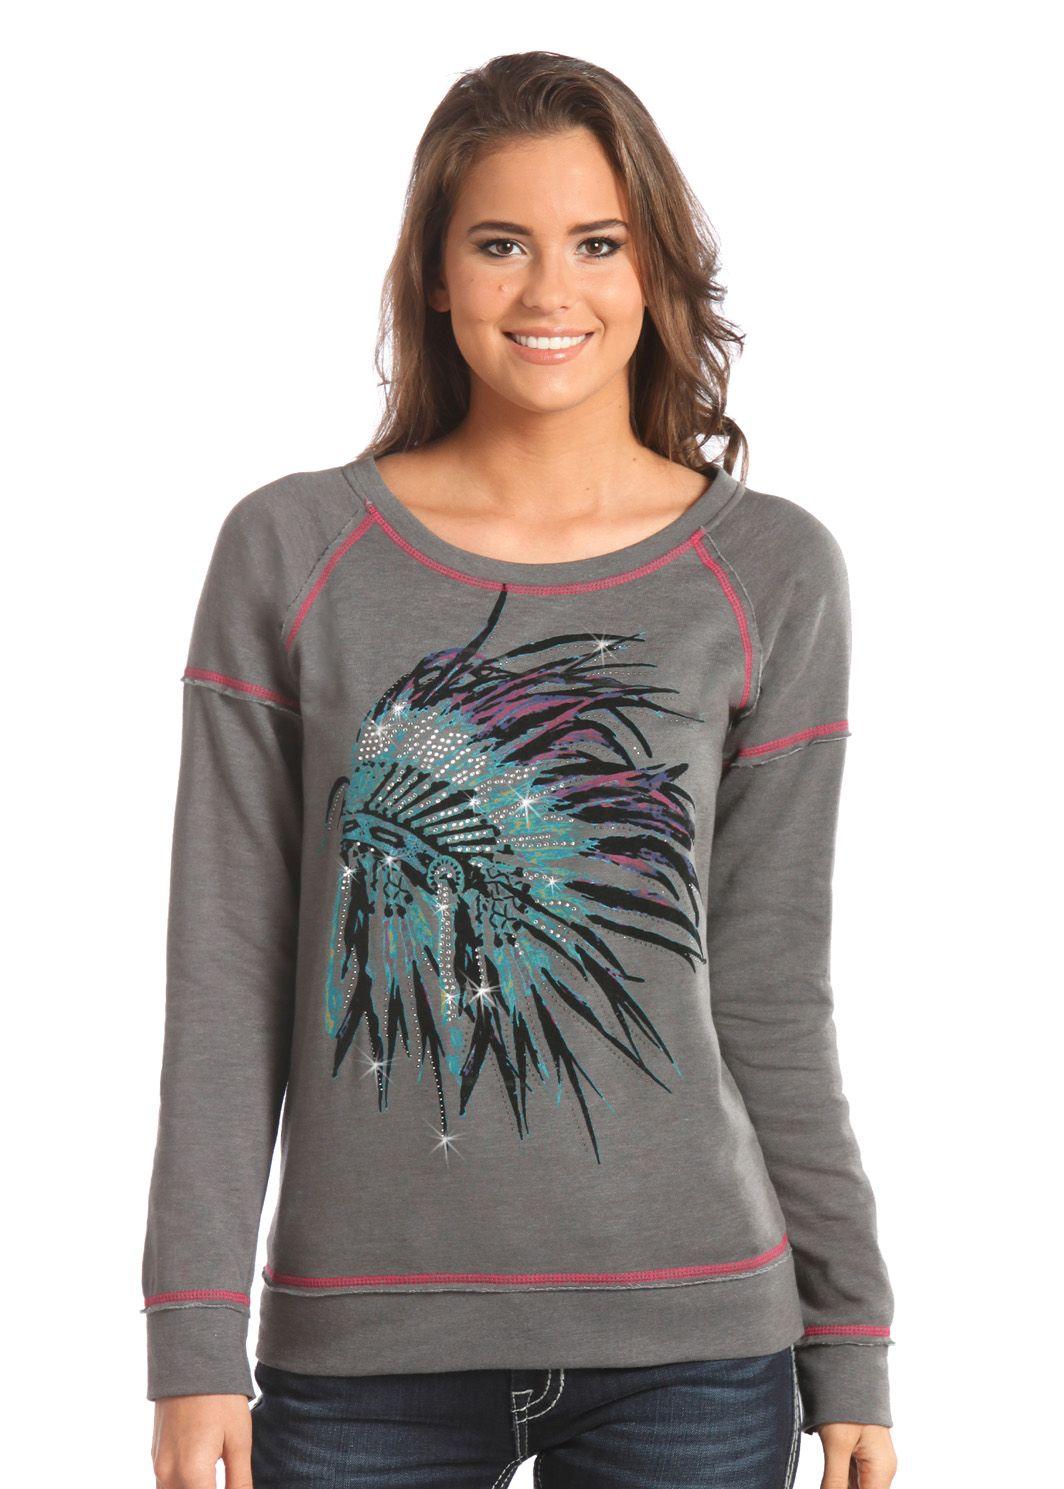 Download Indian Chief Sweatshirt | Panhandle Slim Tops from ...